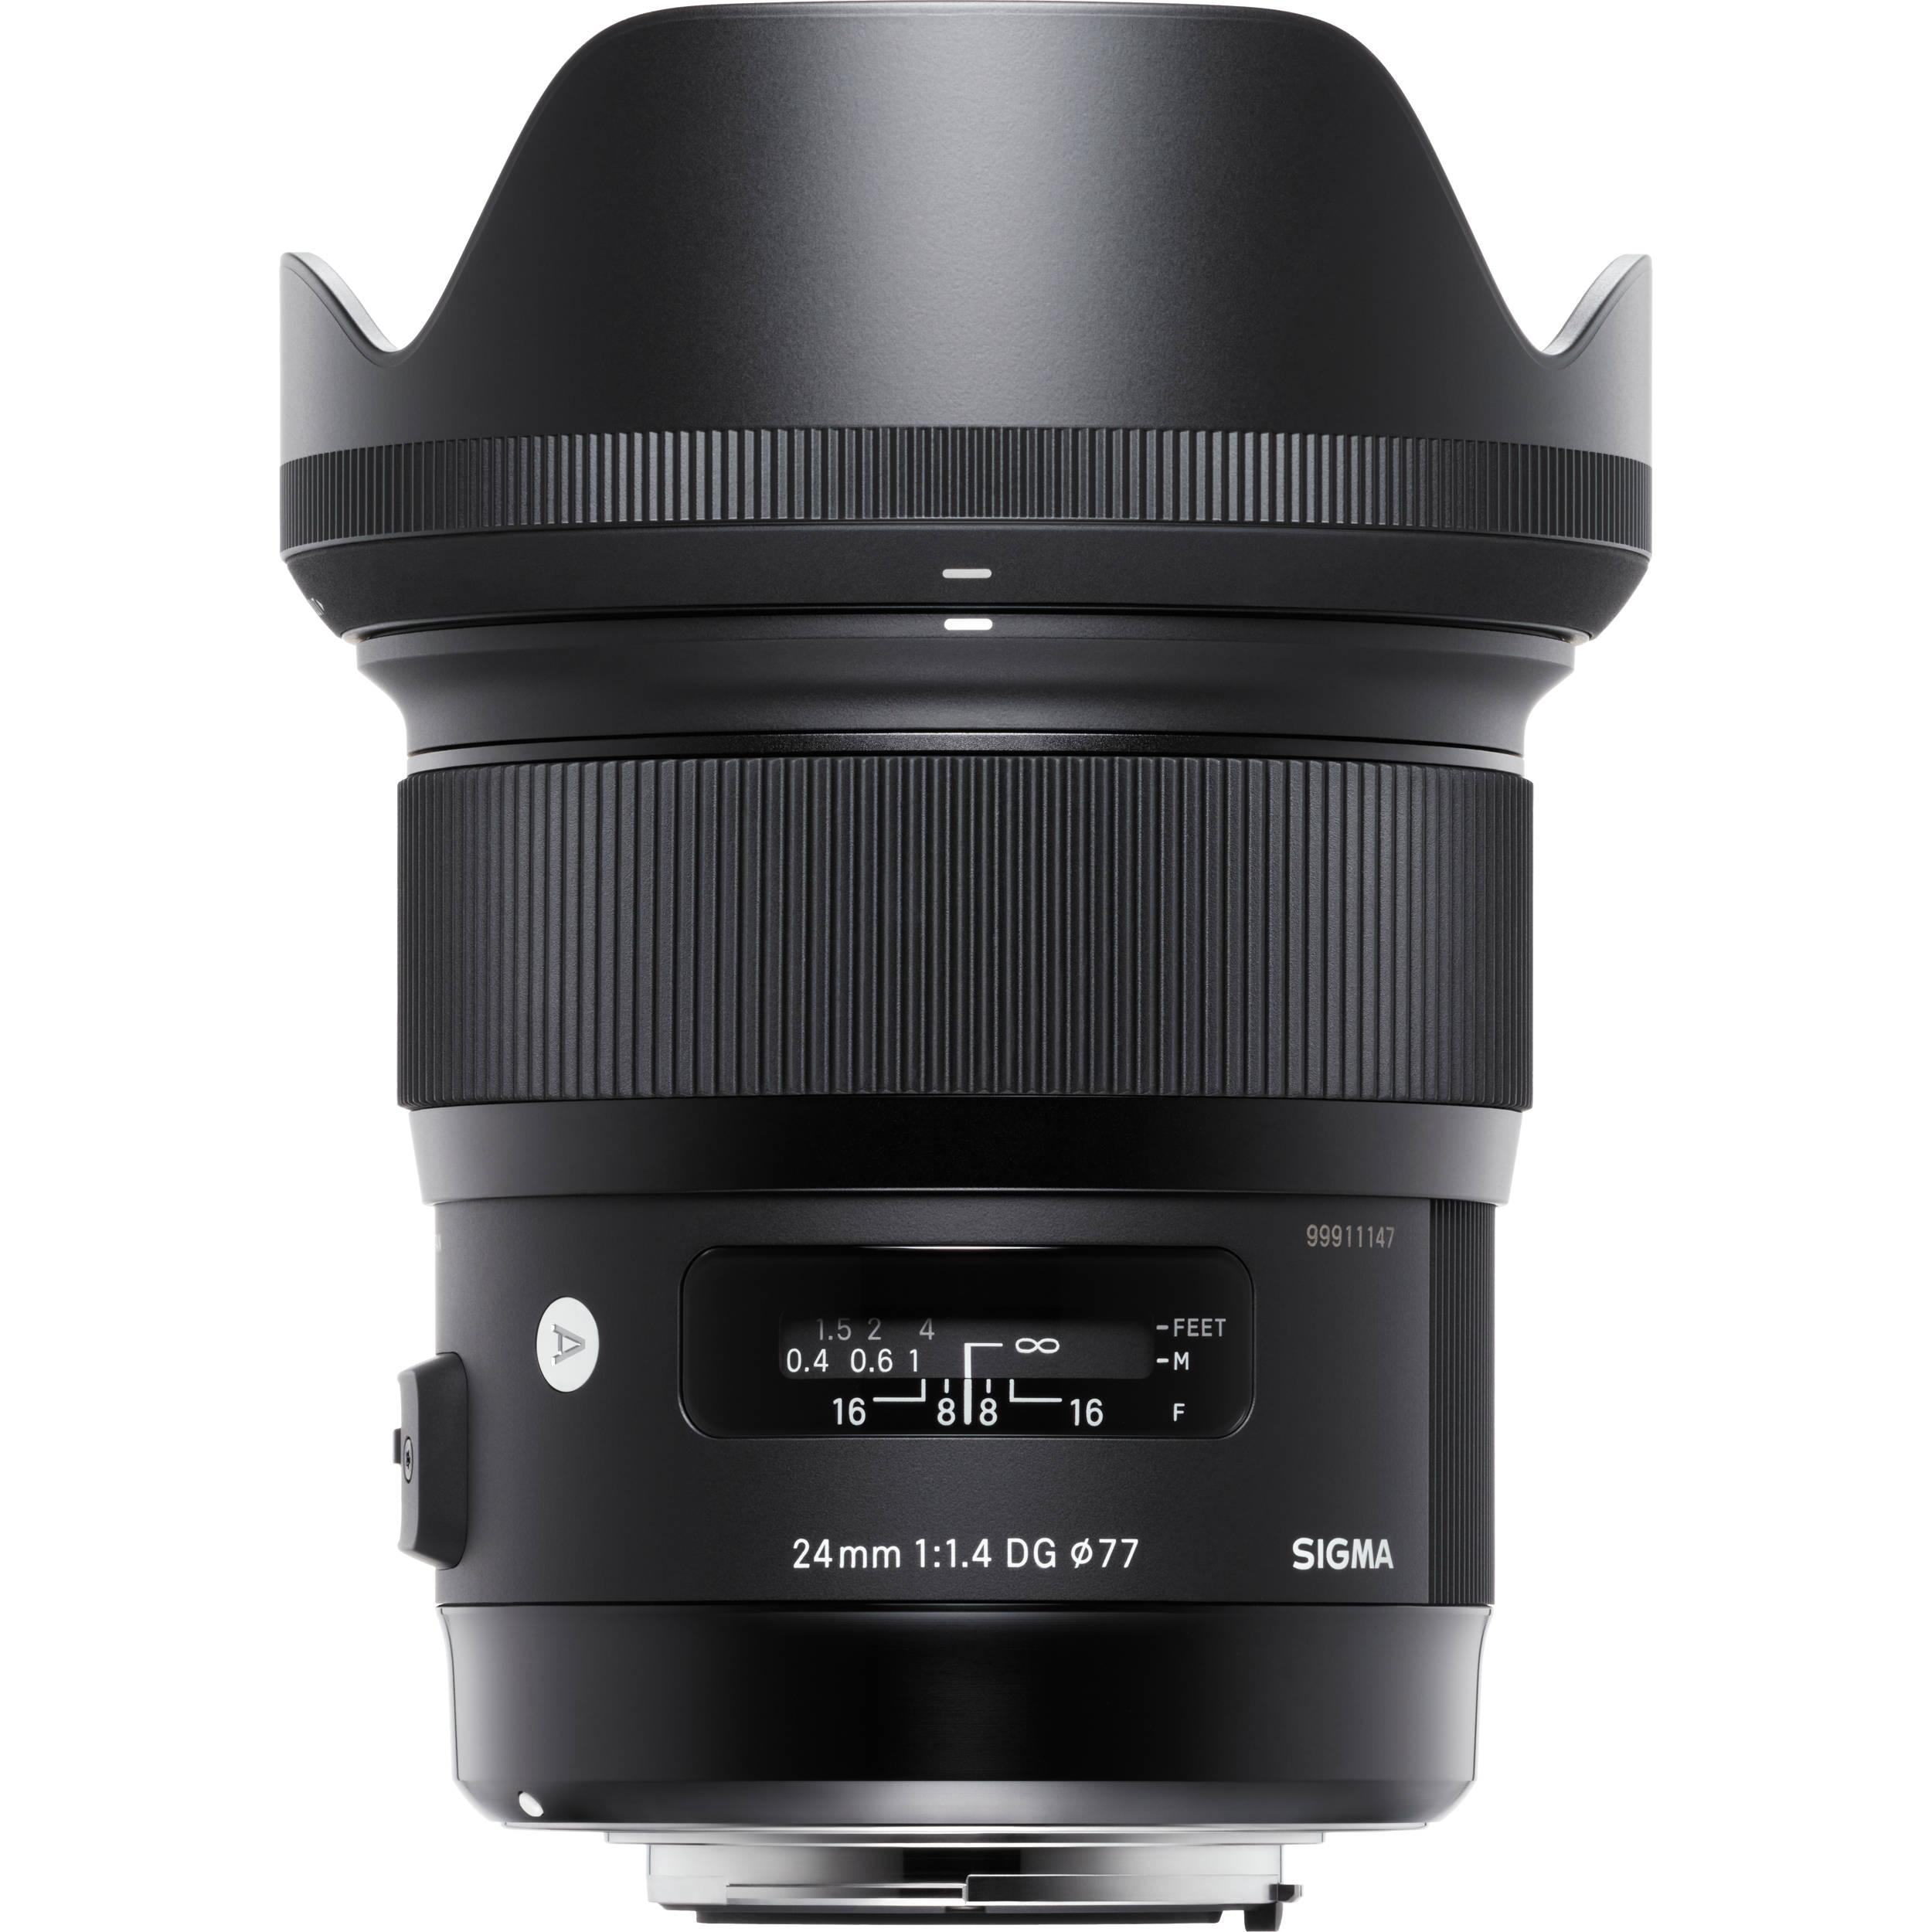 Sigma 24mm F 1 4 Dg Hsm Art Lens For Canon Ef 401 101 B Amp H